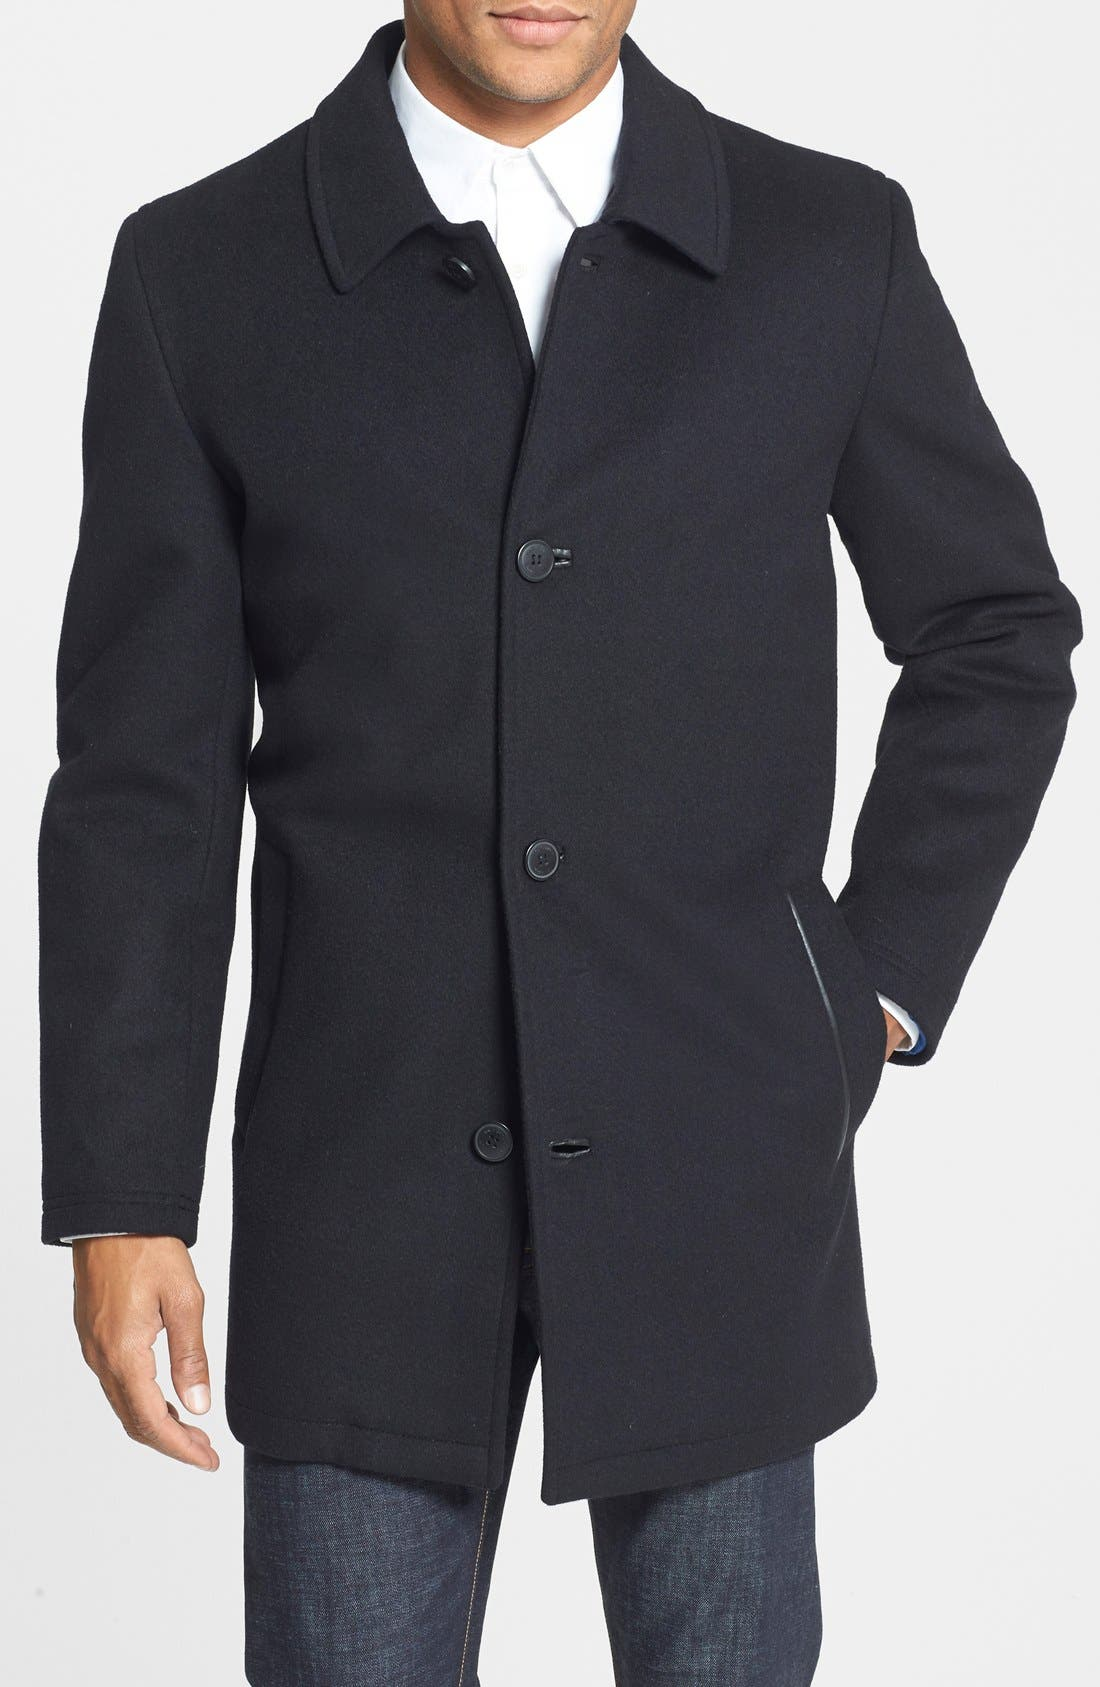 Vince Camuto Water Repellent Wool Blend Car Coat | Nordstrom